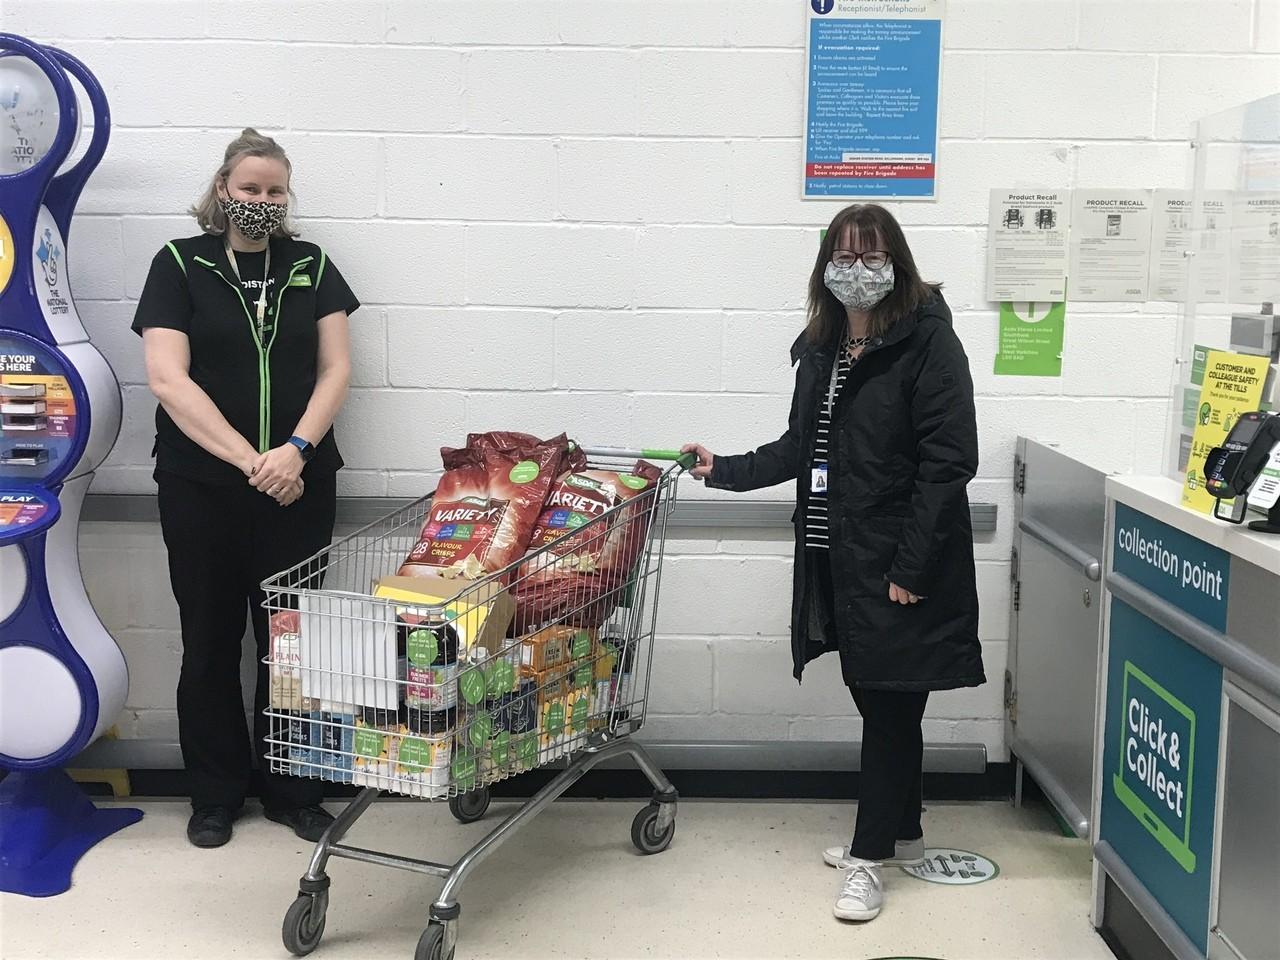 Baking and breakfast club donation for Gillingham Primary School | Asda Gillingham